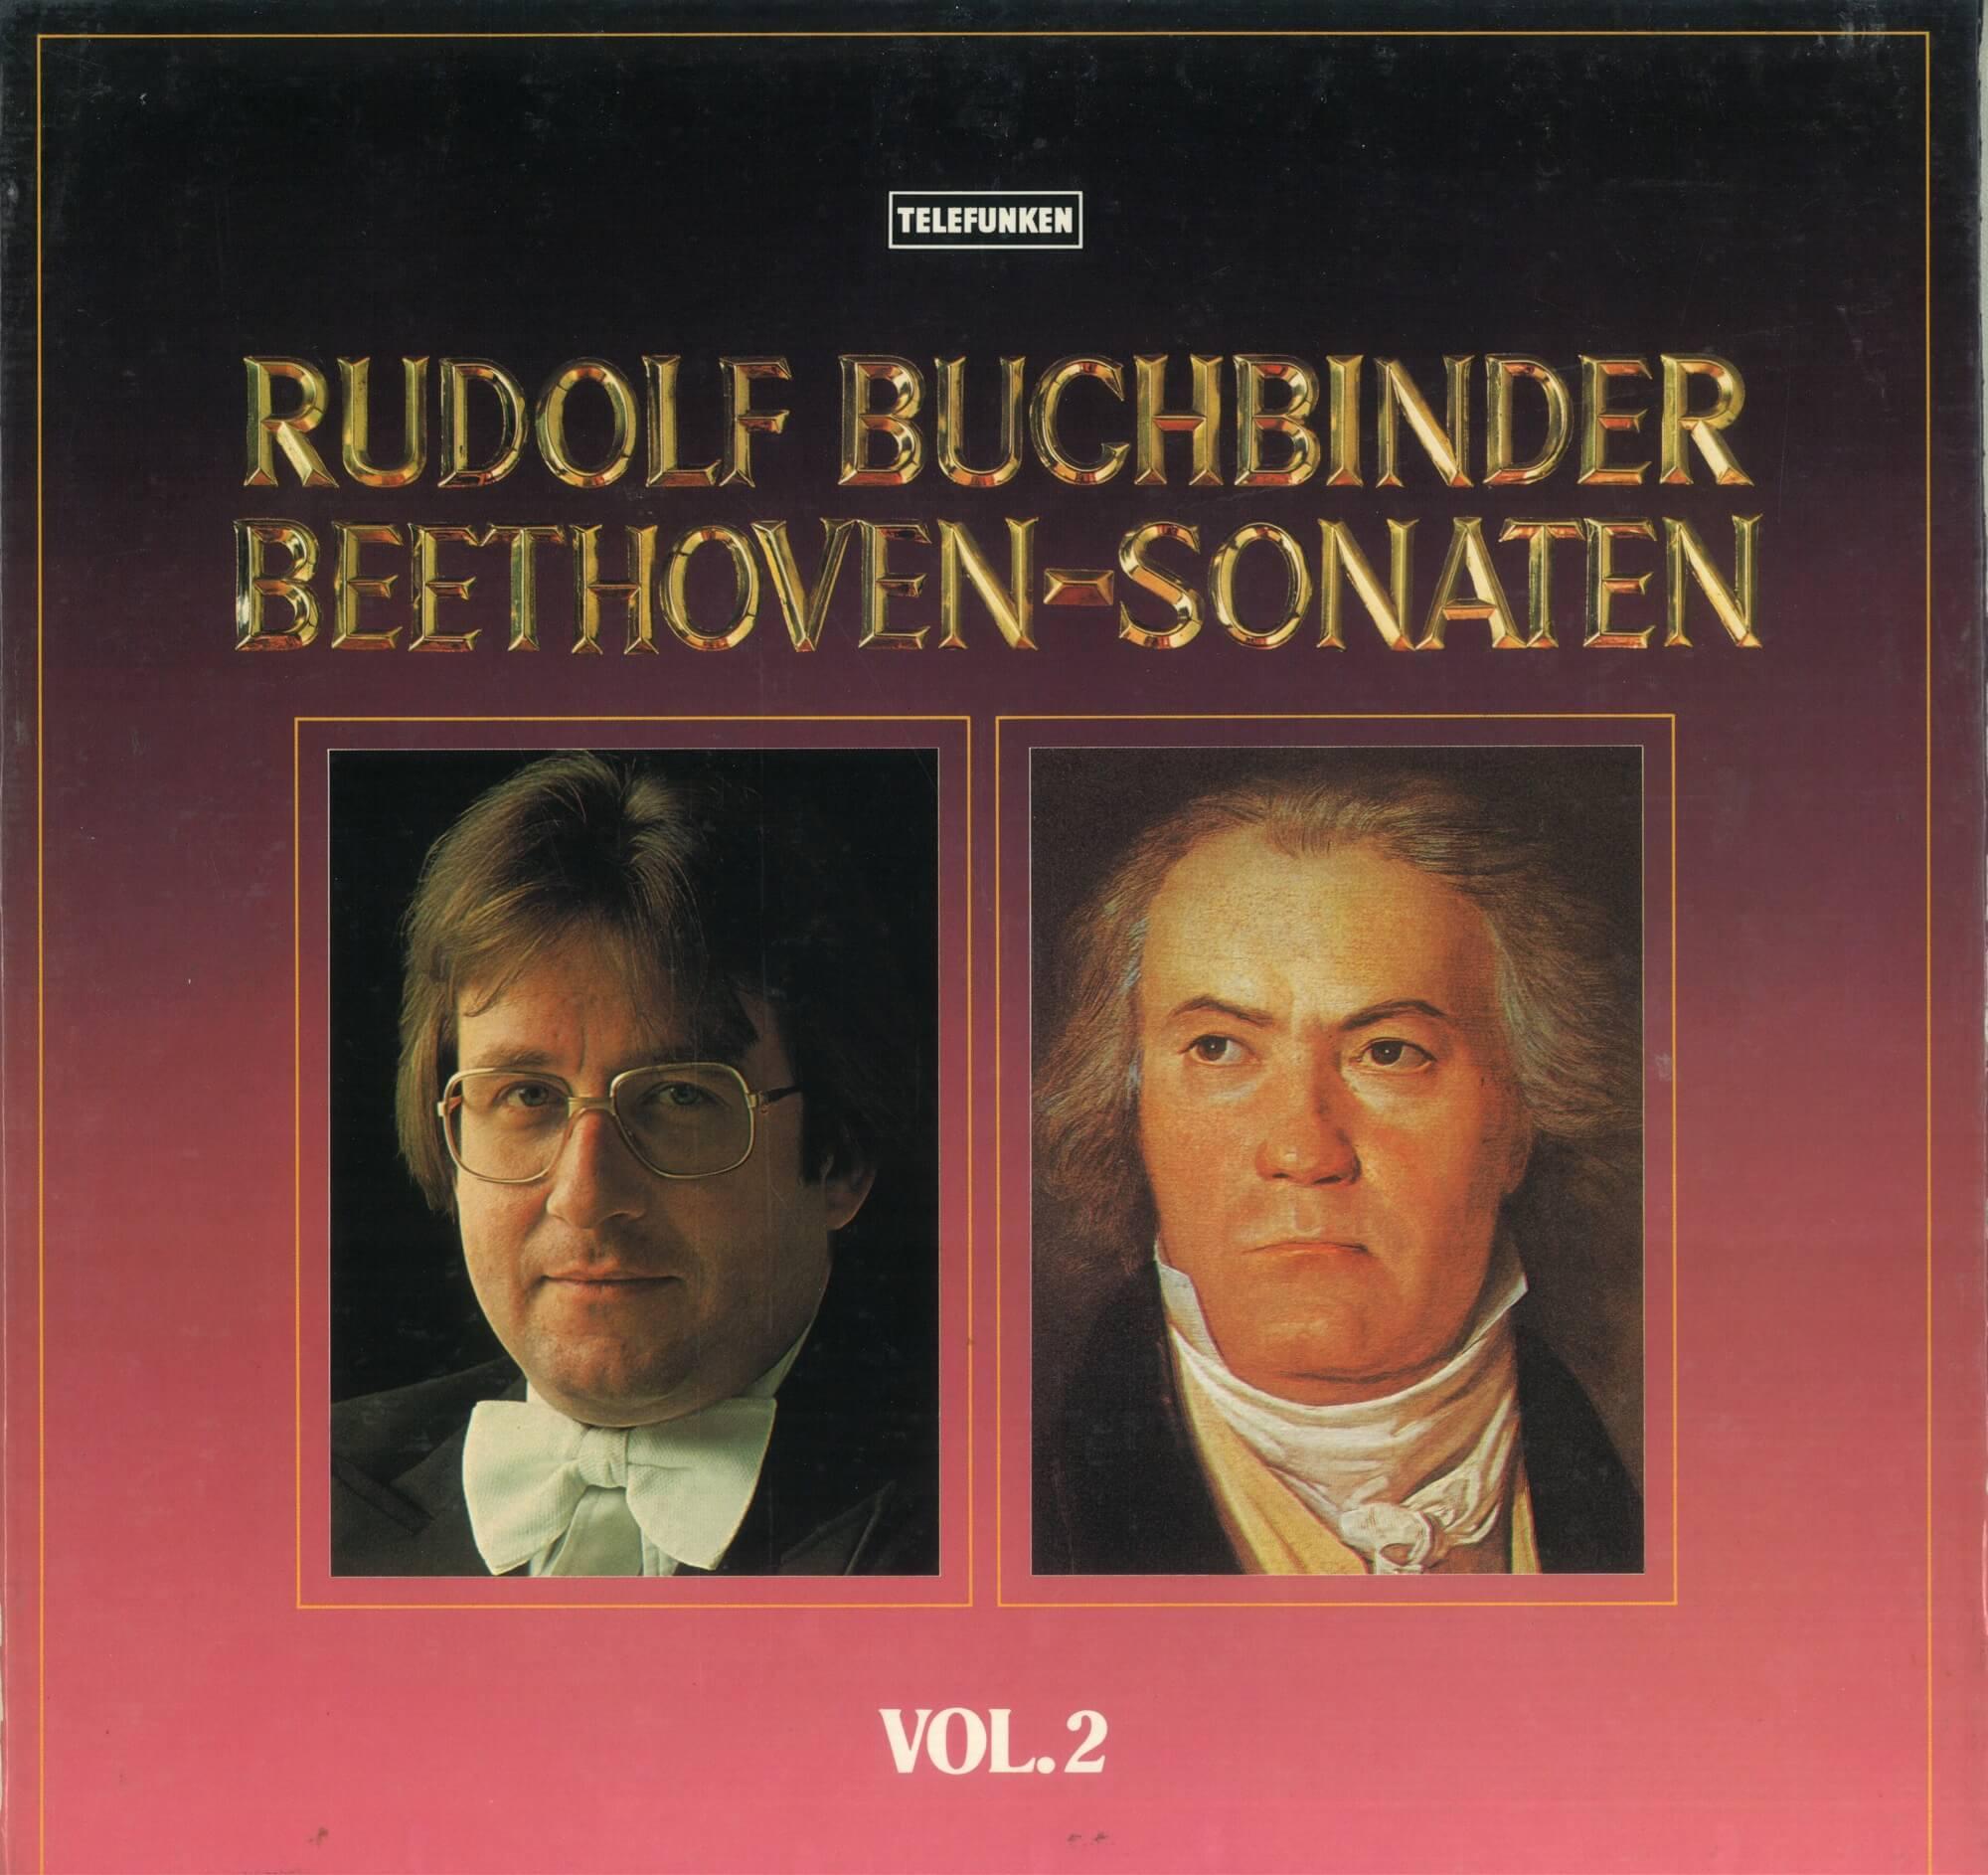 LP Cover Beethoven Sonaten Zyklus Vol 2.jpg